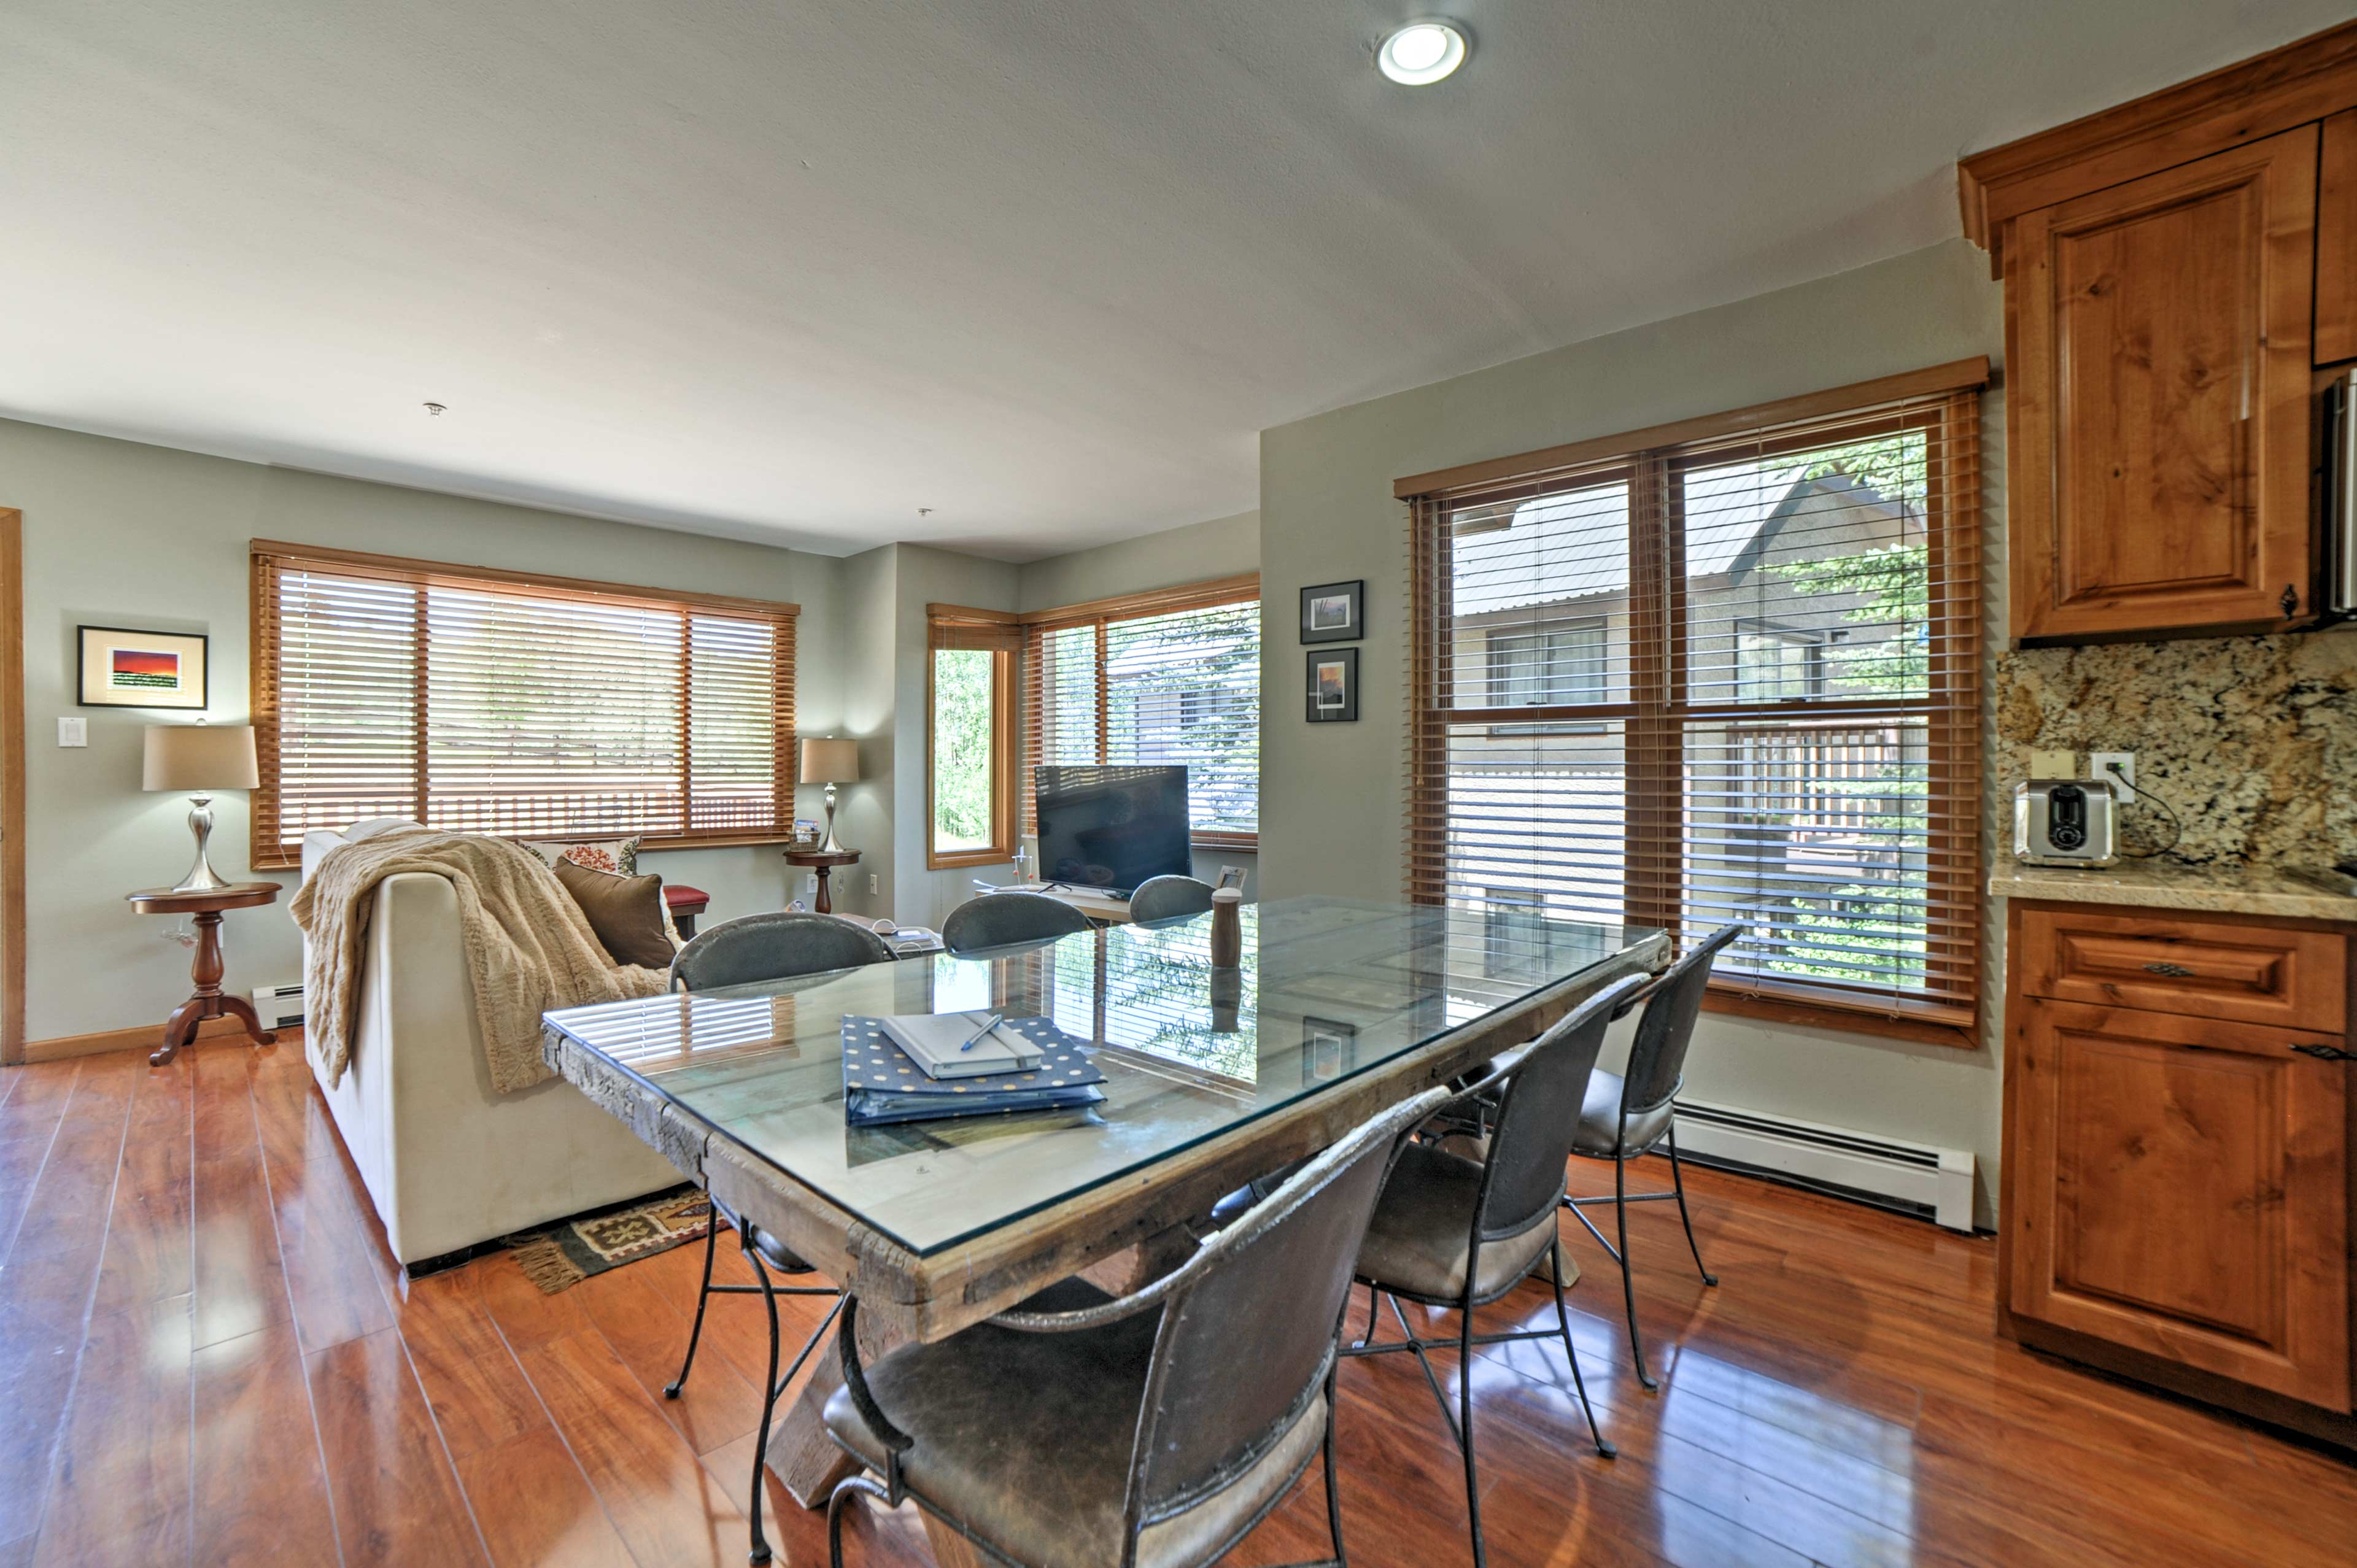 Abundant windows flood the main living space with natural light.